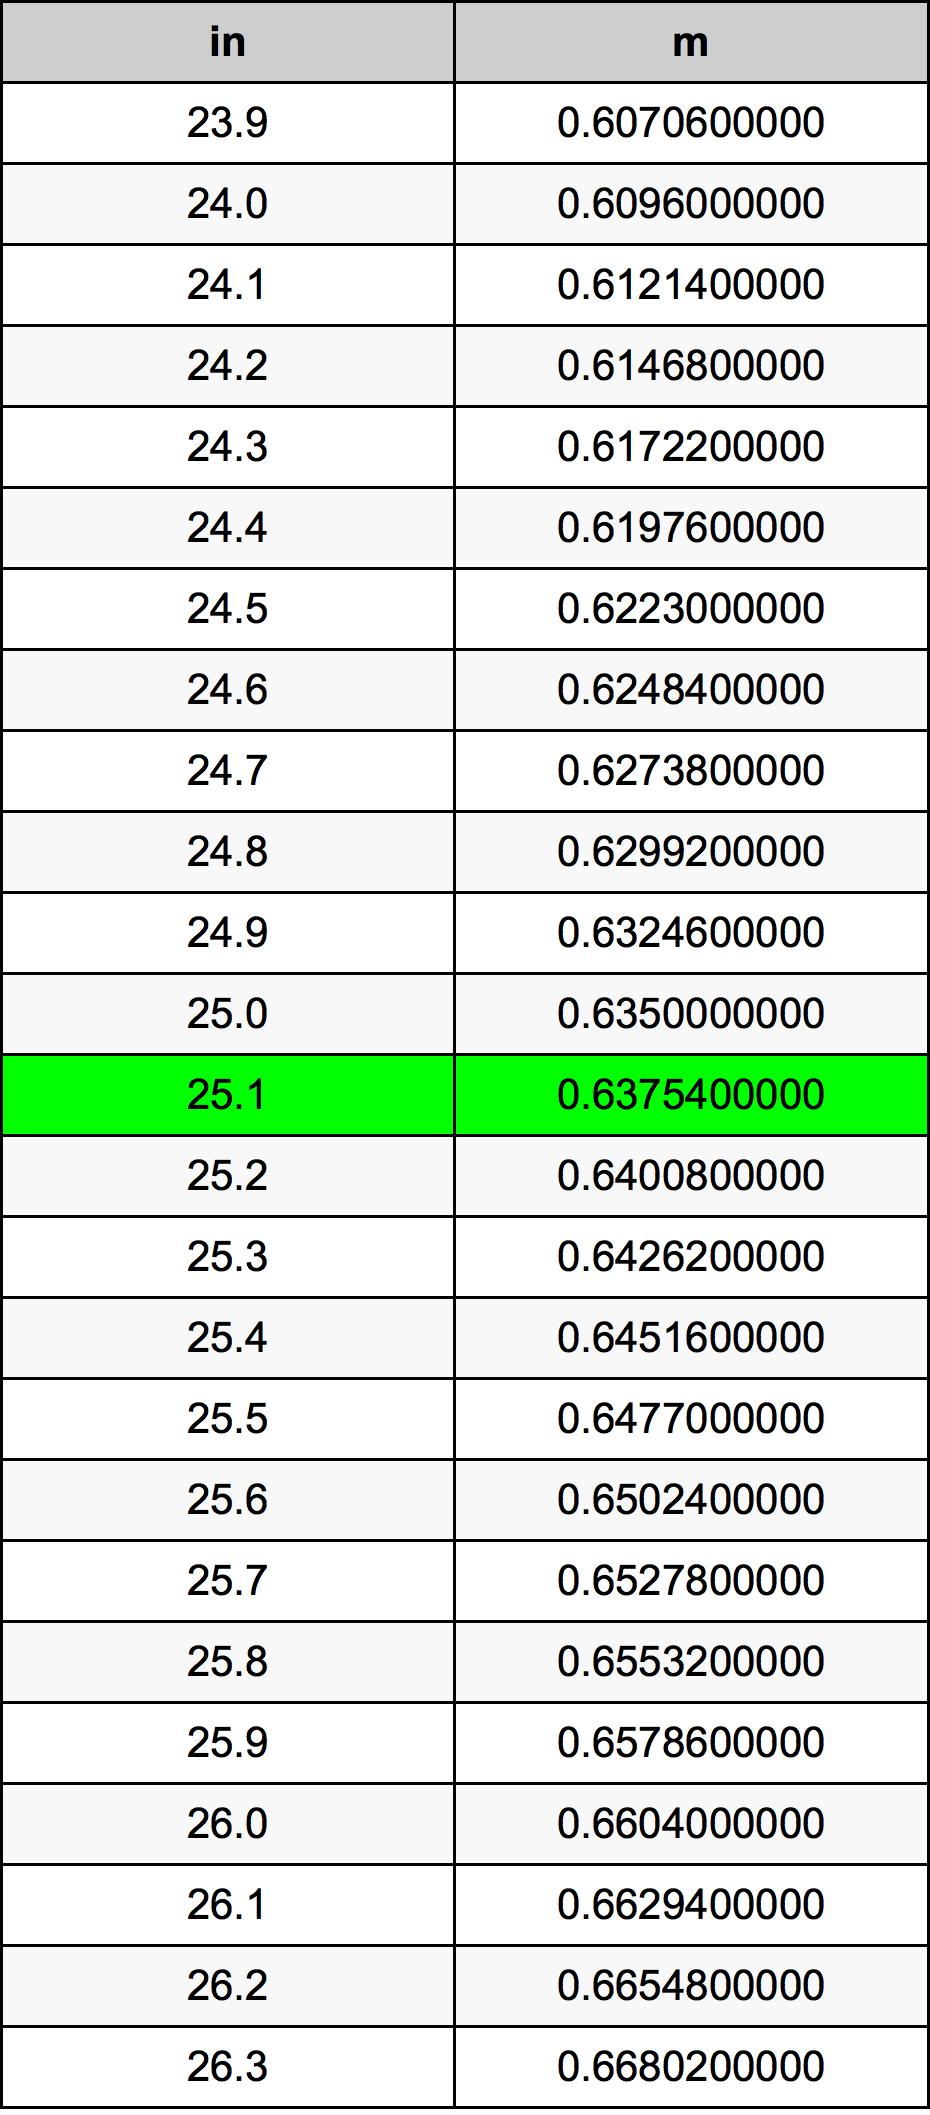 25.1 इंच रूपांतरण सारणी